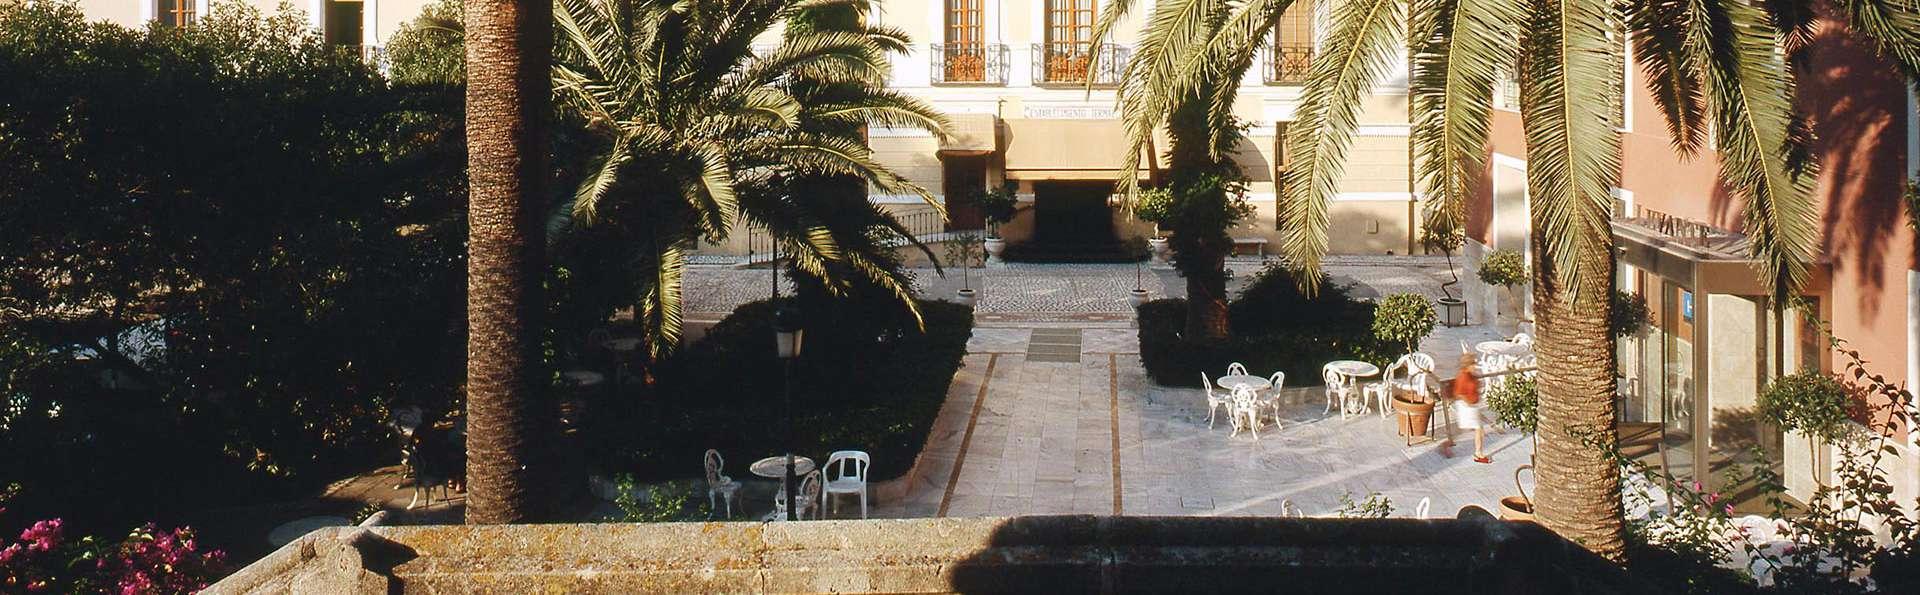 Balneario de Archena - Hotel Termas - EDIT_NEW_exterior.jpg